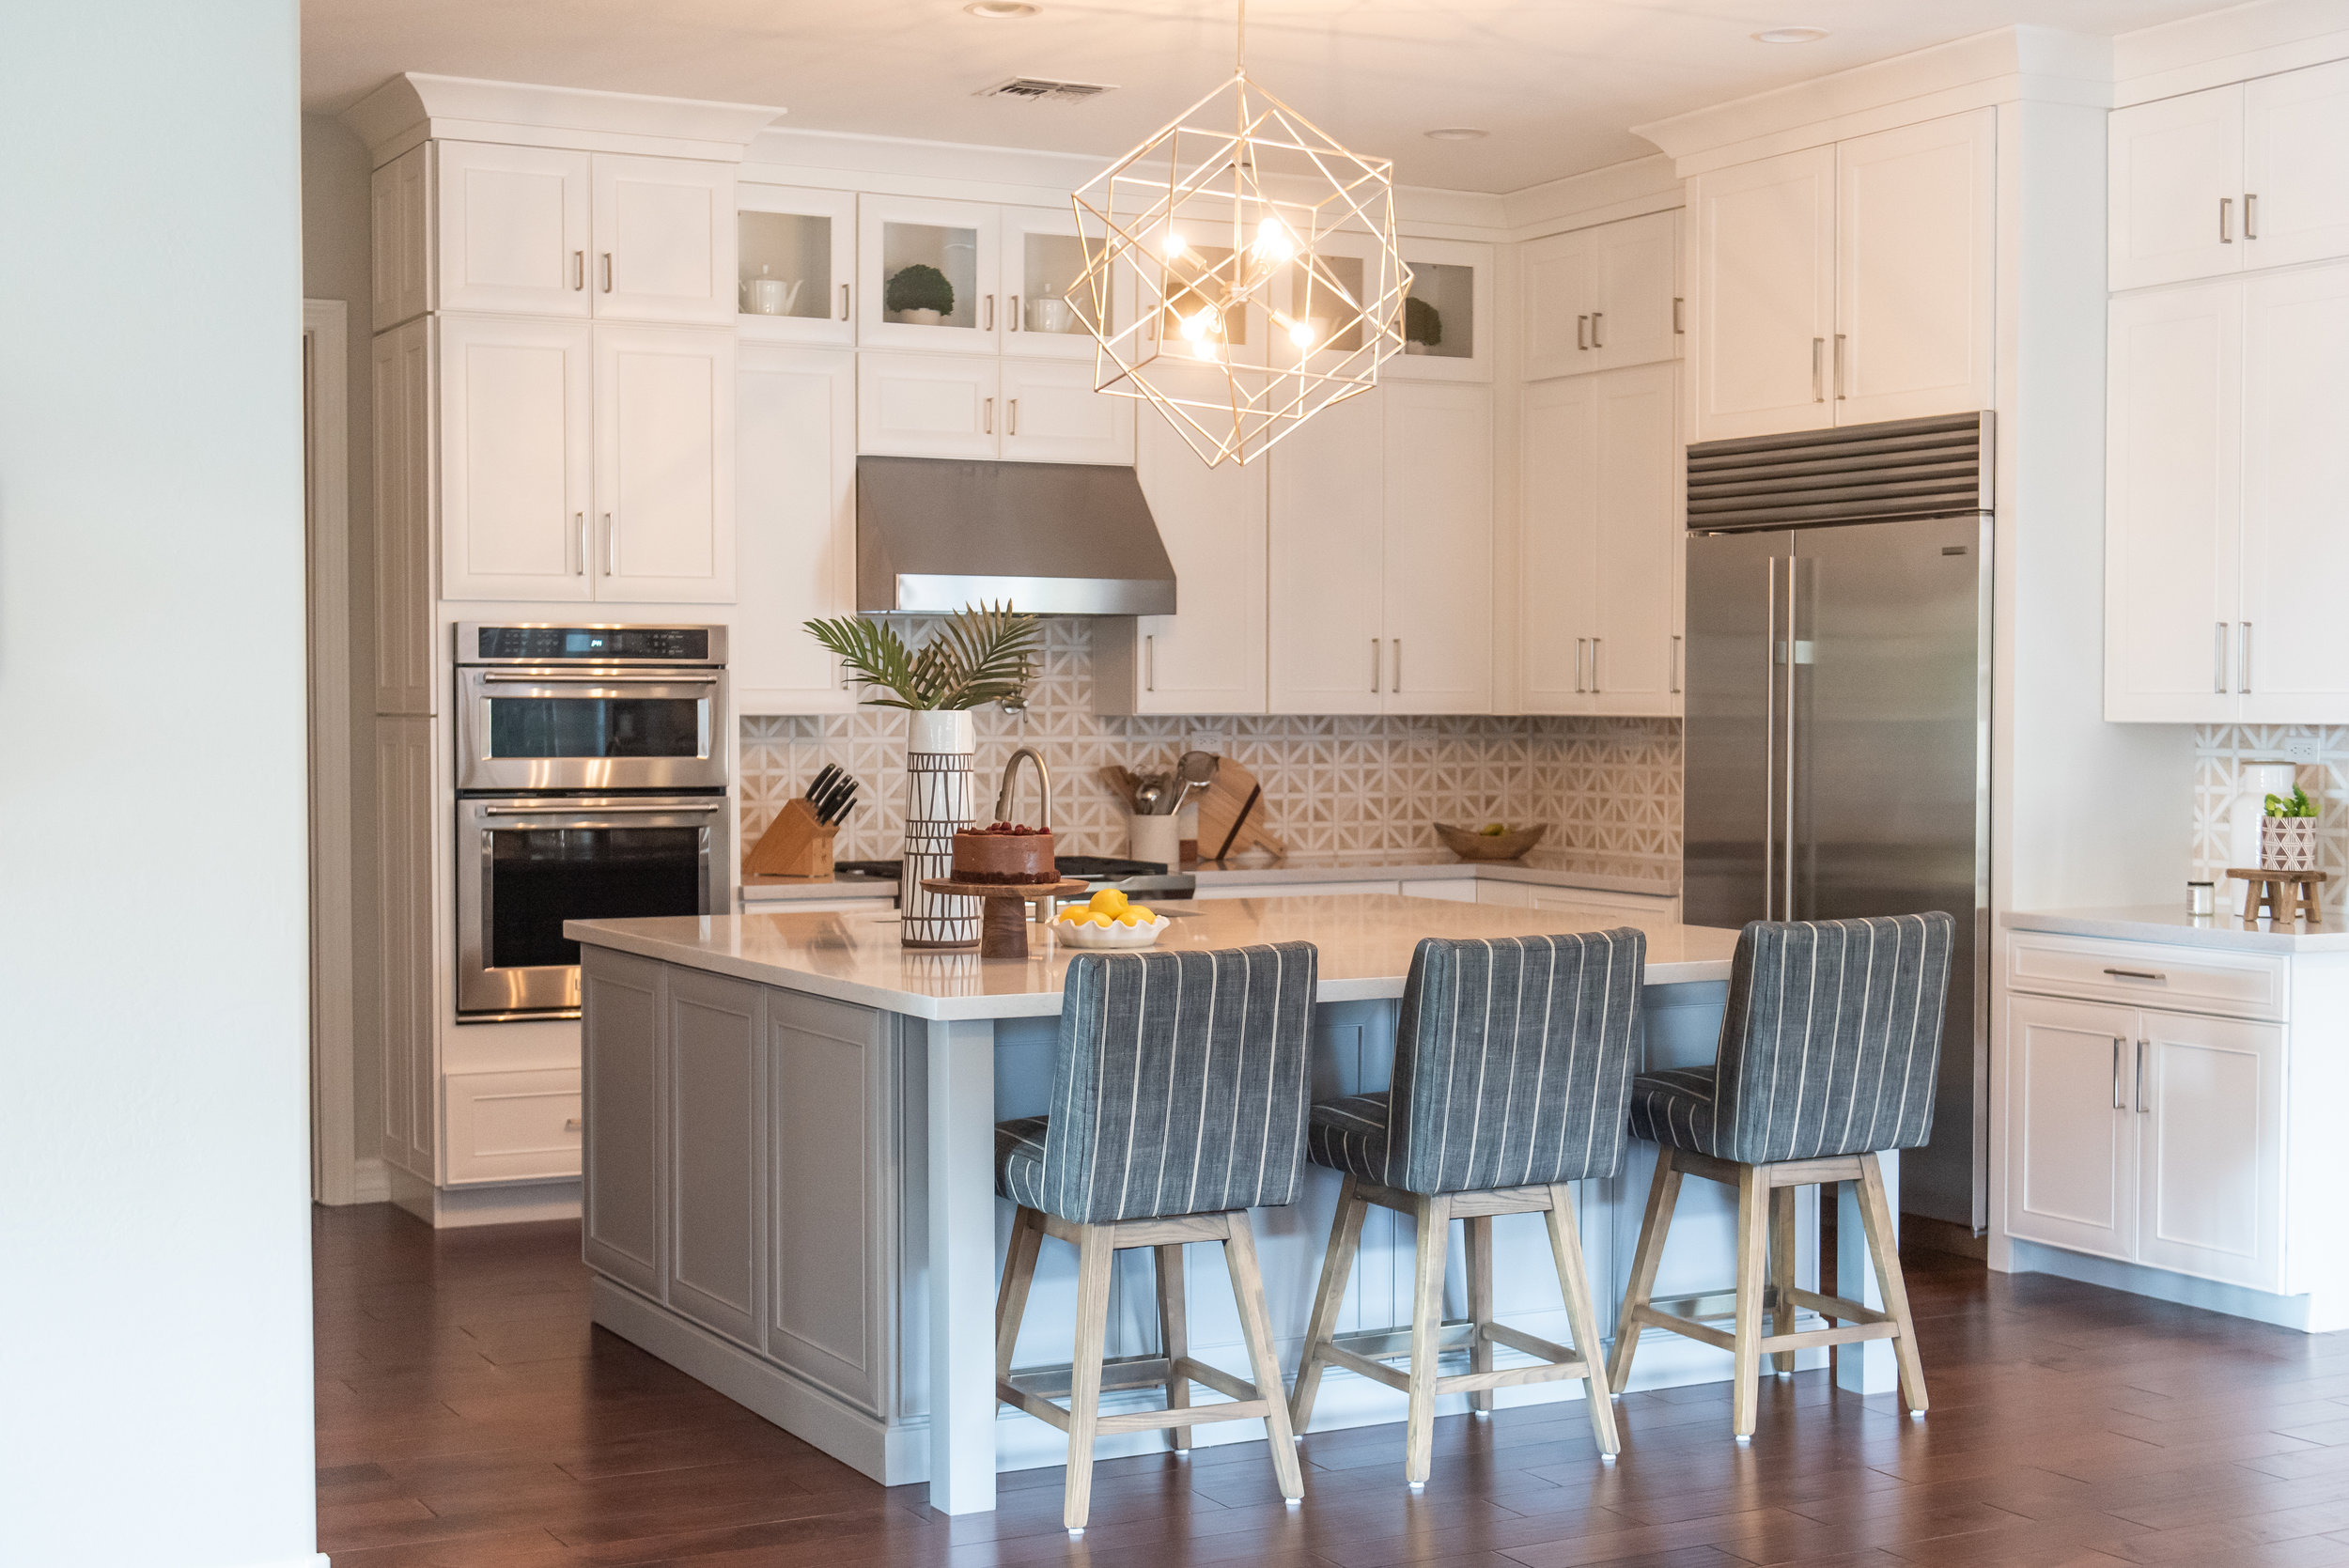 Kitchen +geometric +lighting +backsplash +hood +barstools +silestone +white-cabinets.jpg